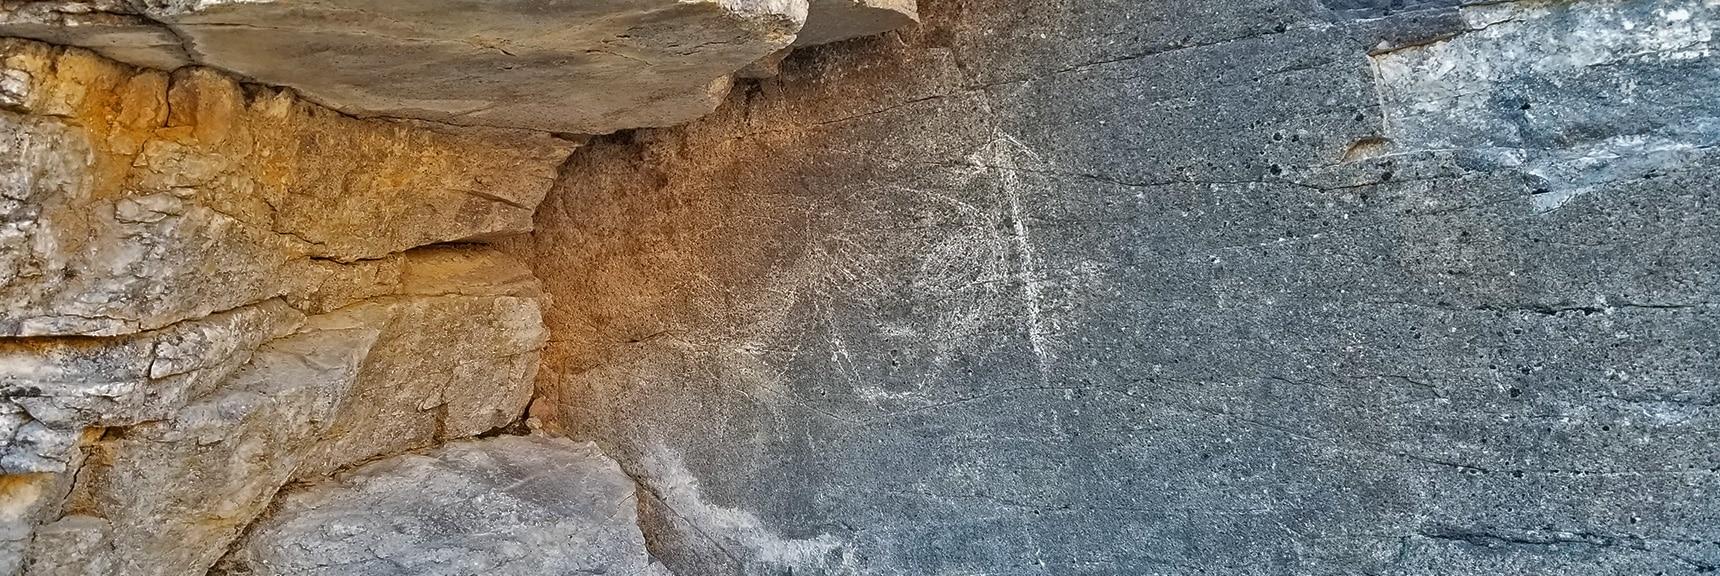 First Petroglyph Appears to Be Modern Graffiti. | Petroglyph Canyon | Sloan Canyon National Conservation Area, Nevada